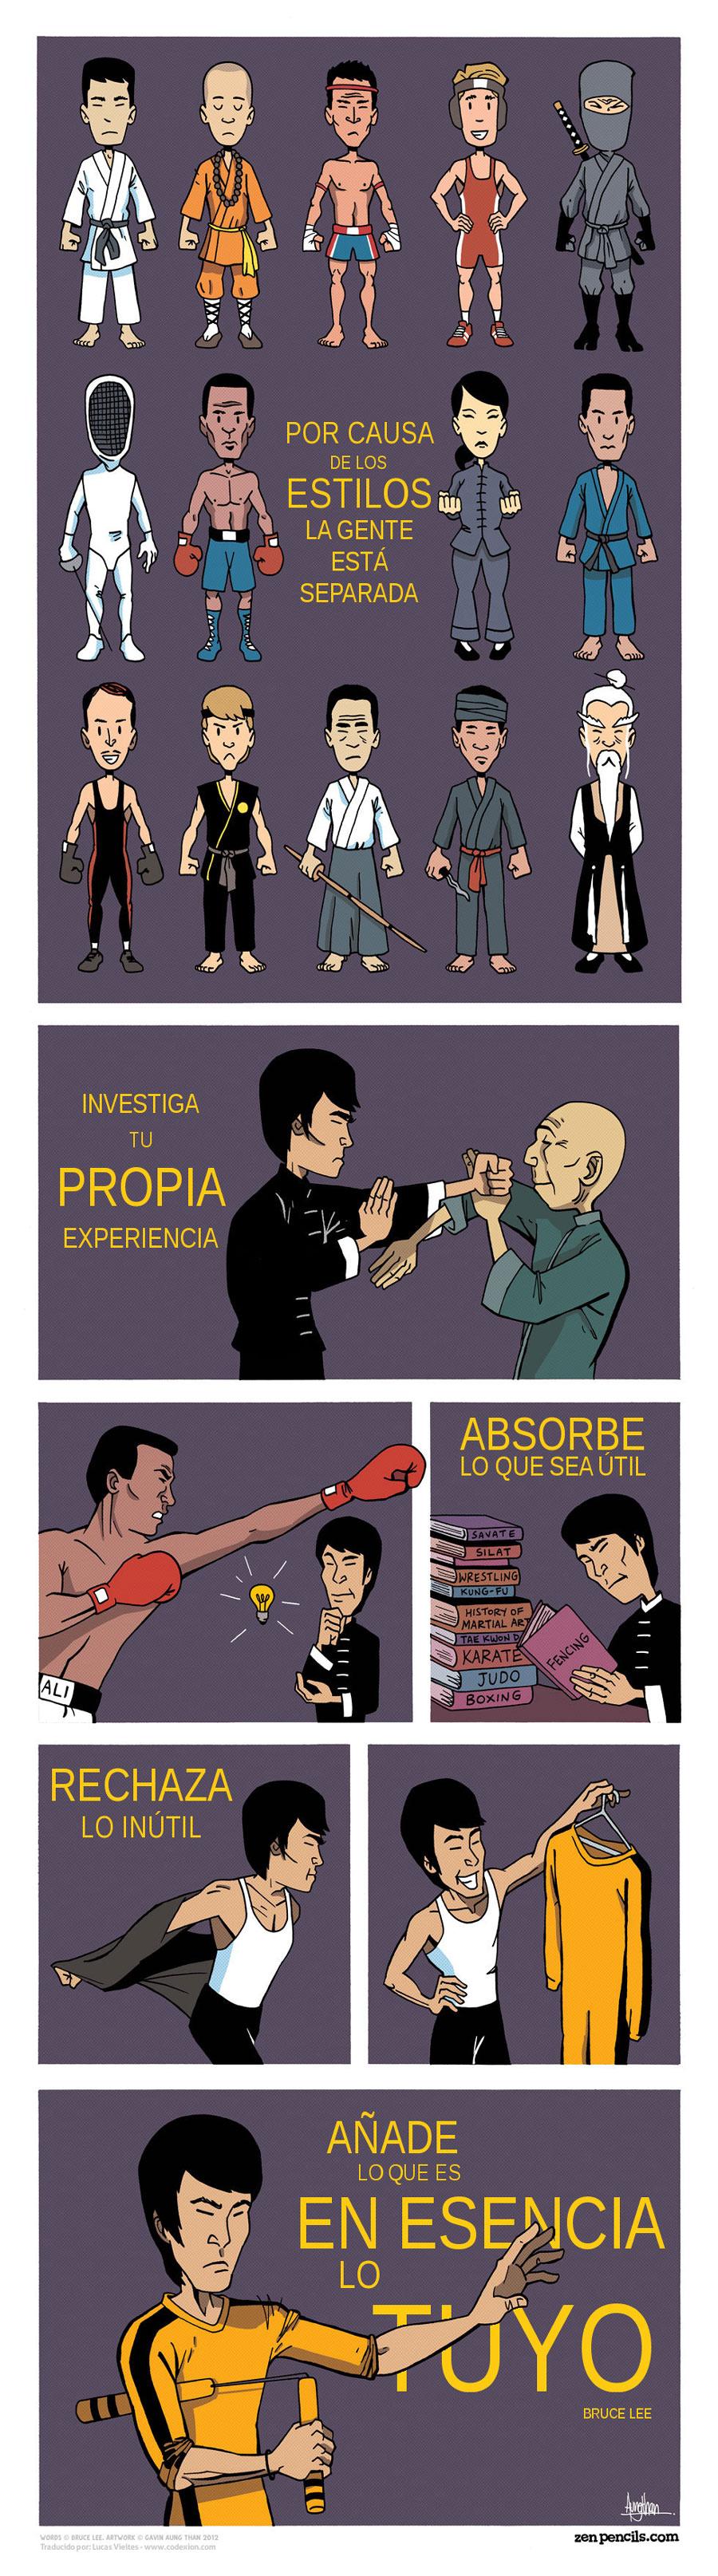 2010-01-19-35-Bruce-Lee-SPANISH.jpg